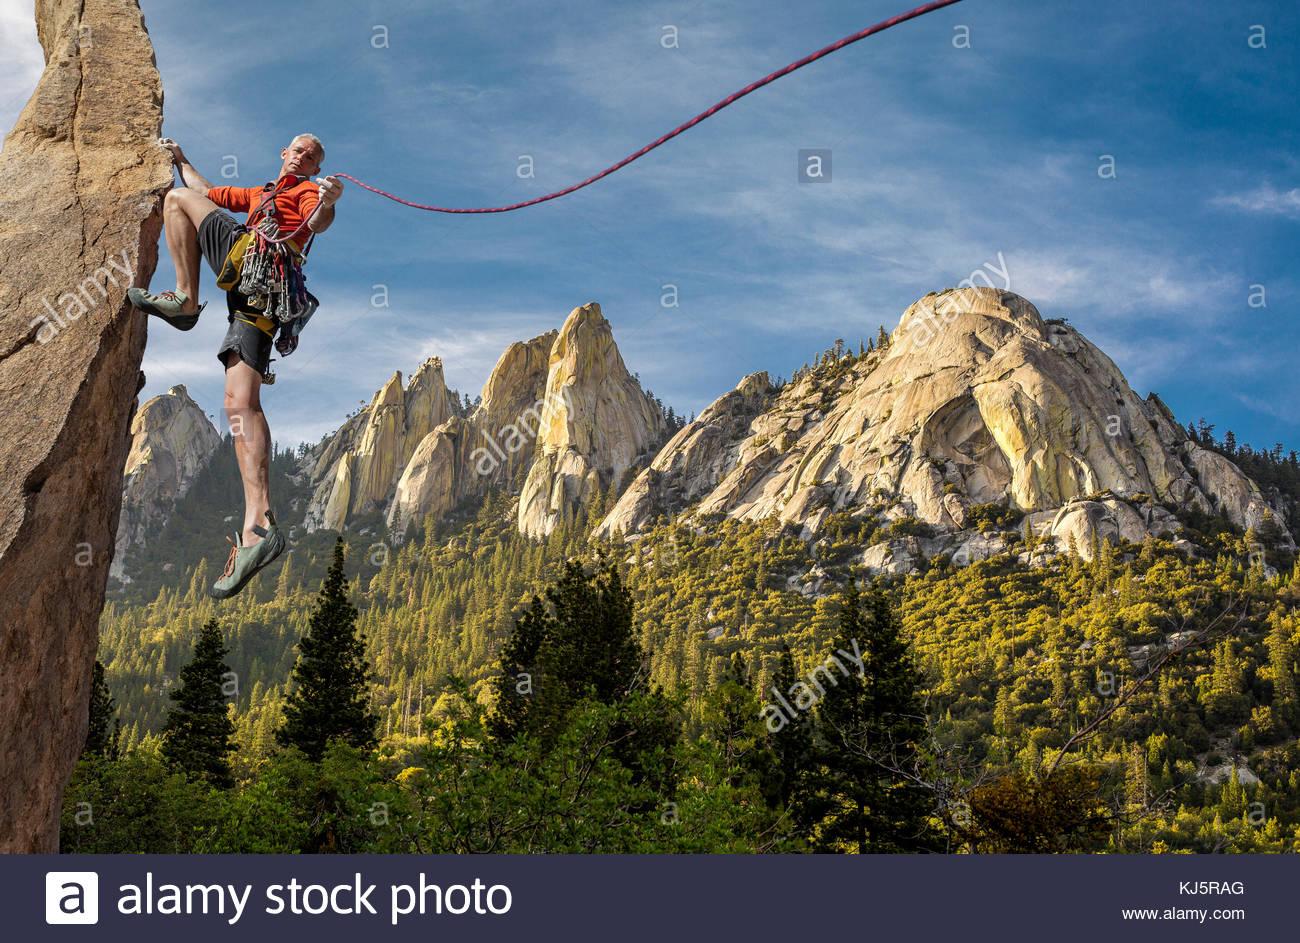 Kletterer Holding ein Seil. Schöne Berglandschaft Stockbild